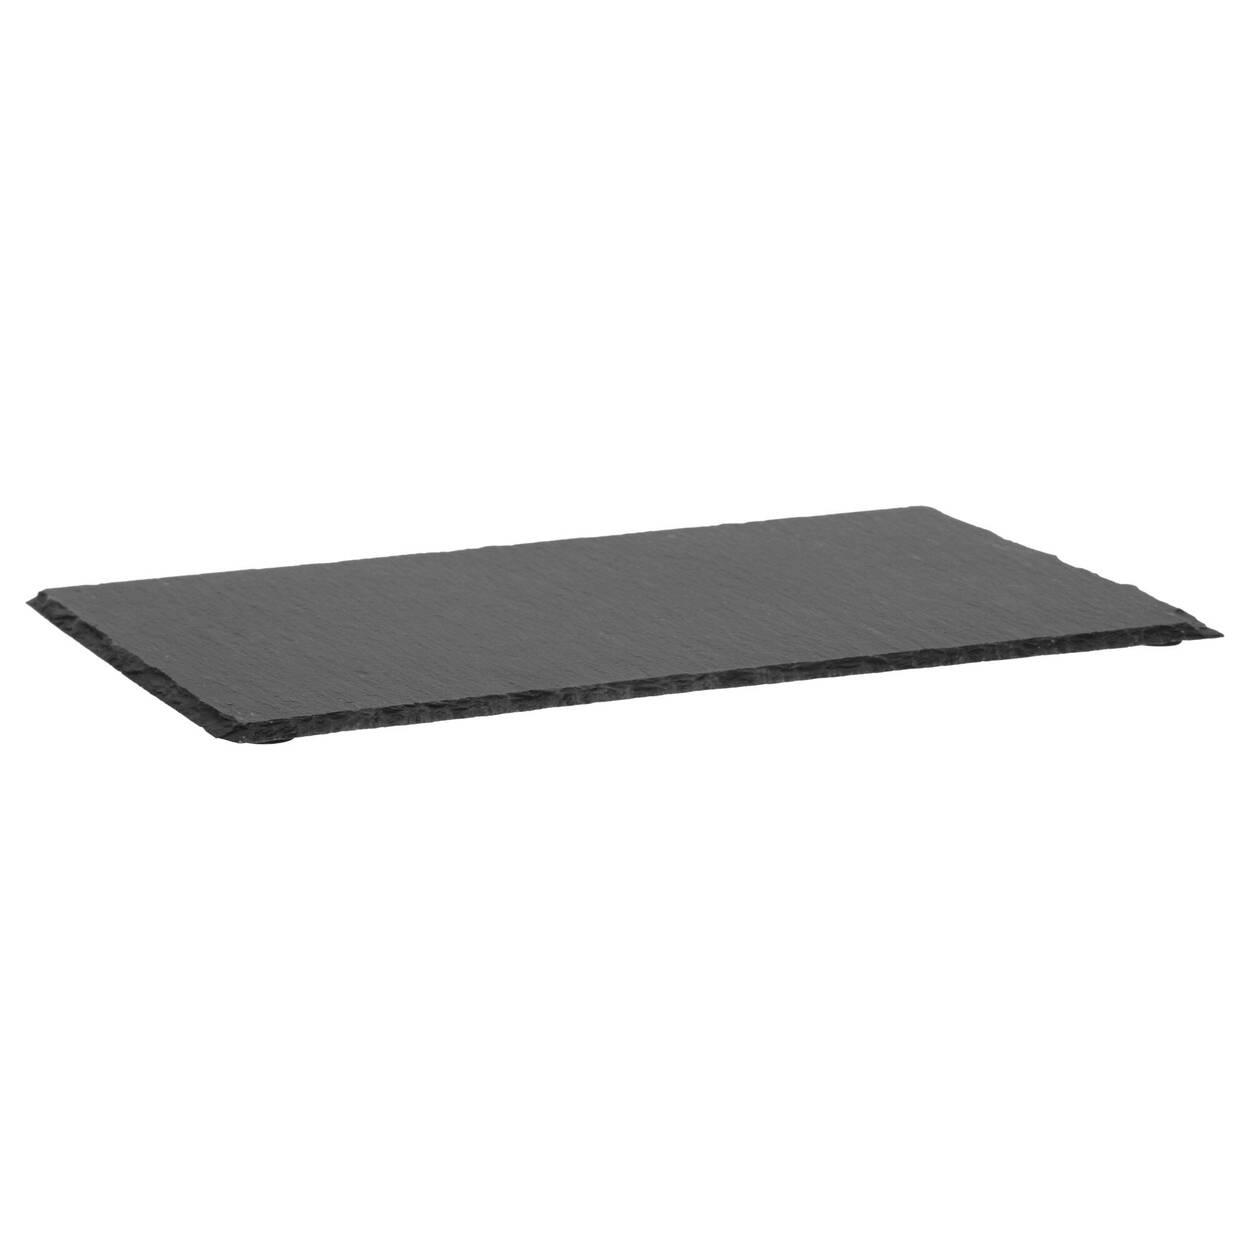 Slate Serving Plate 20 cm X 30 cm